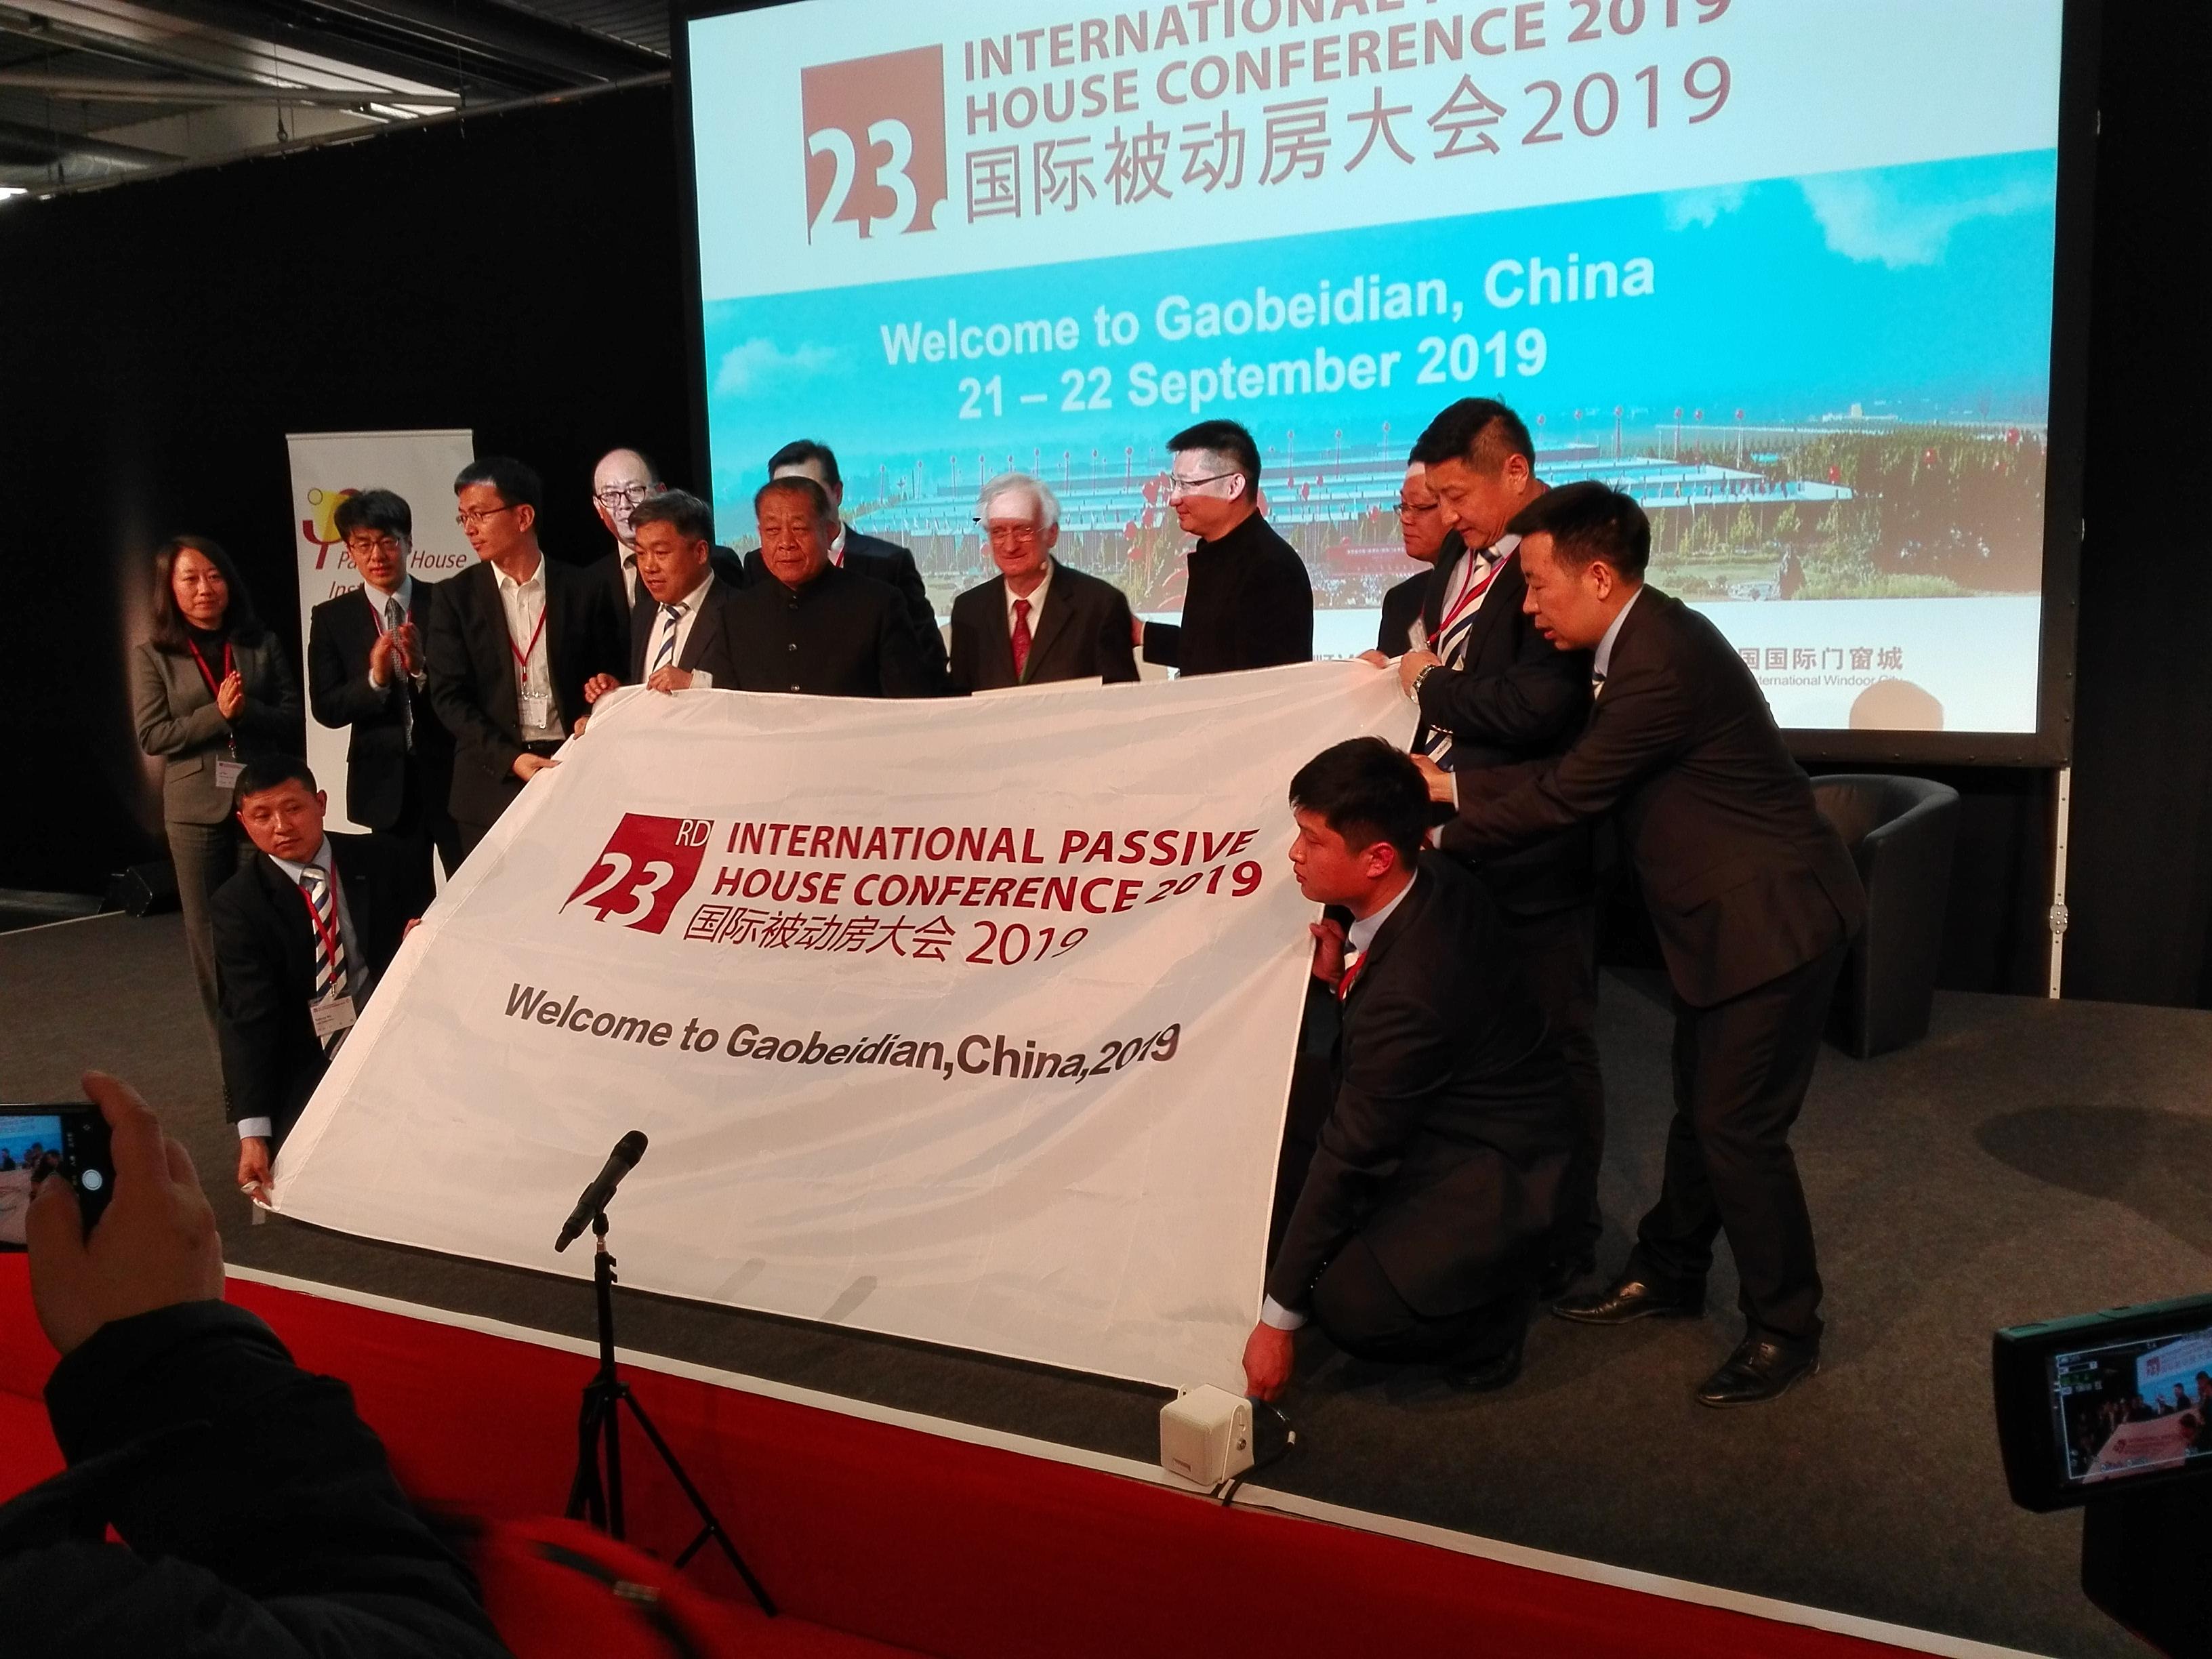 Energiehaus_Passivhaus_22intPHC